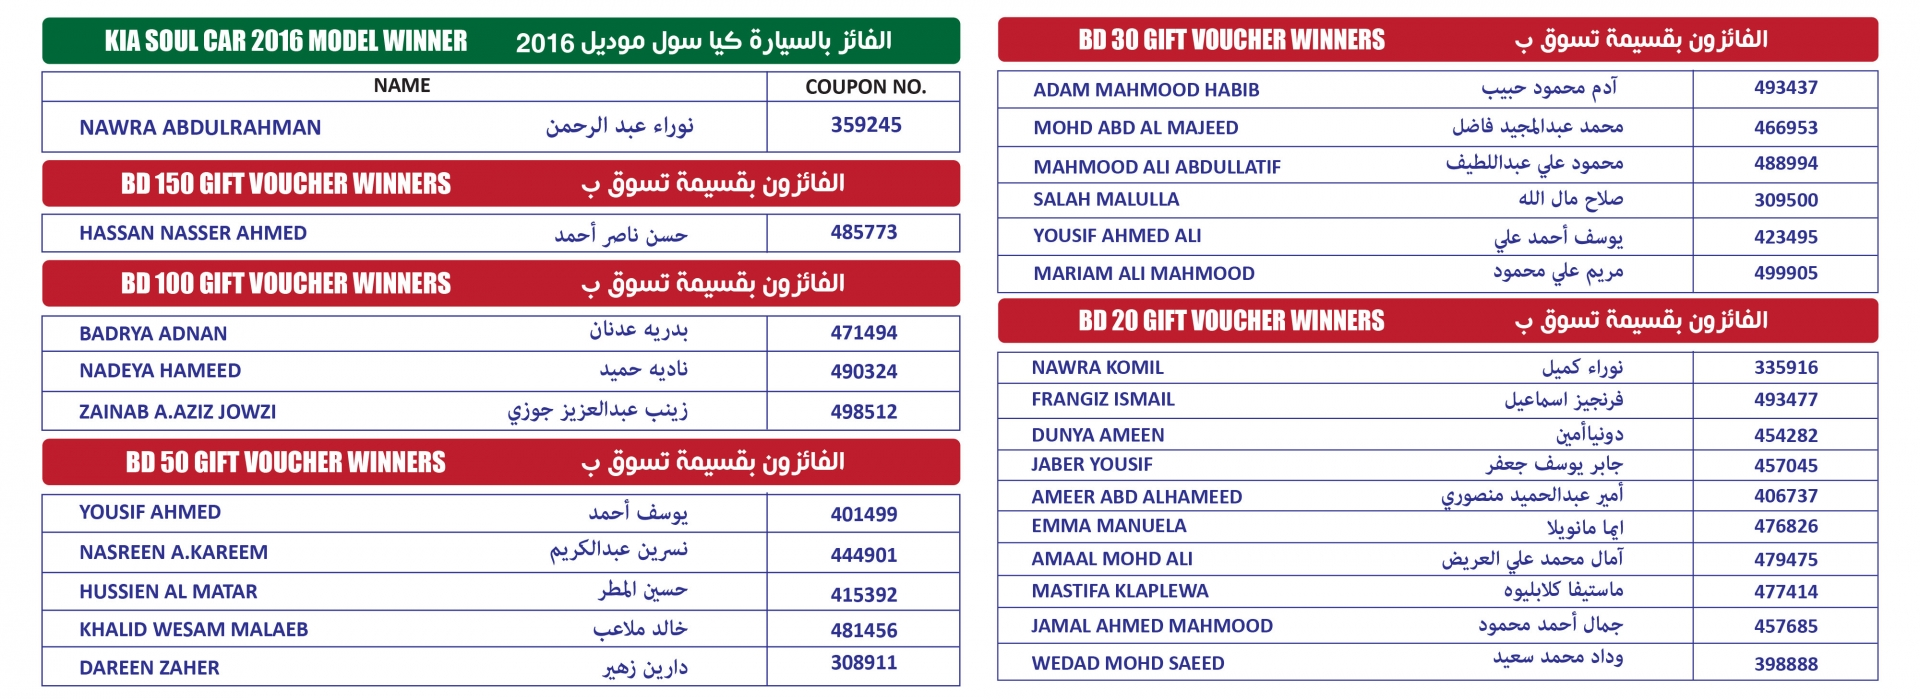 list of winners of December 29 raffle draw